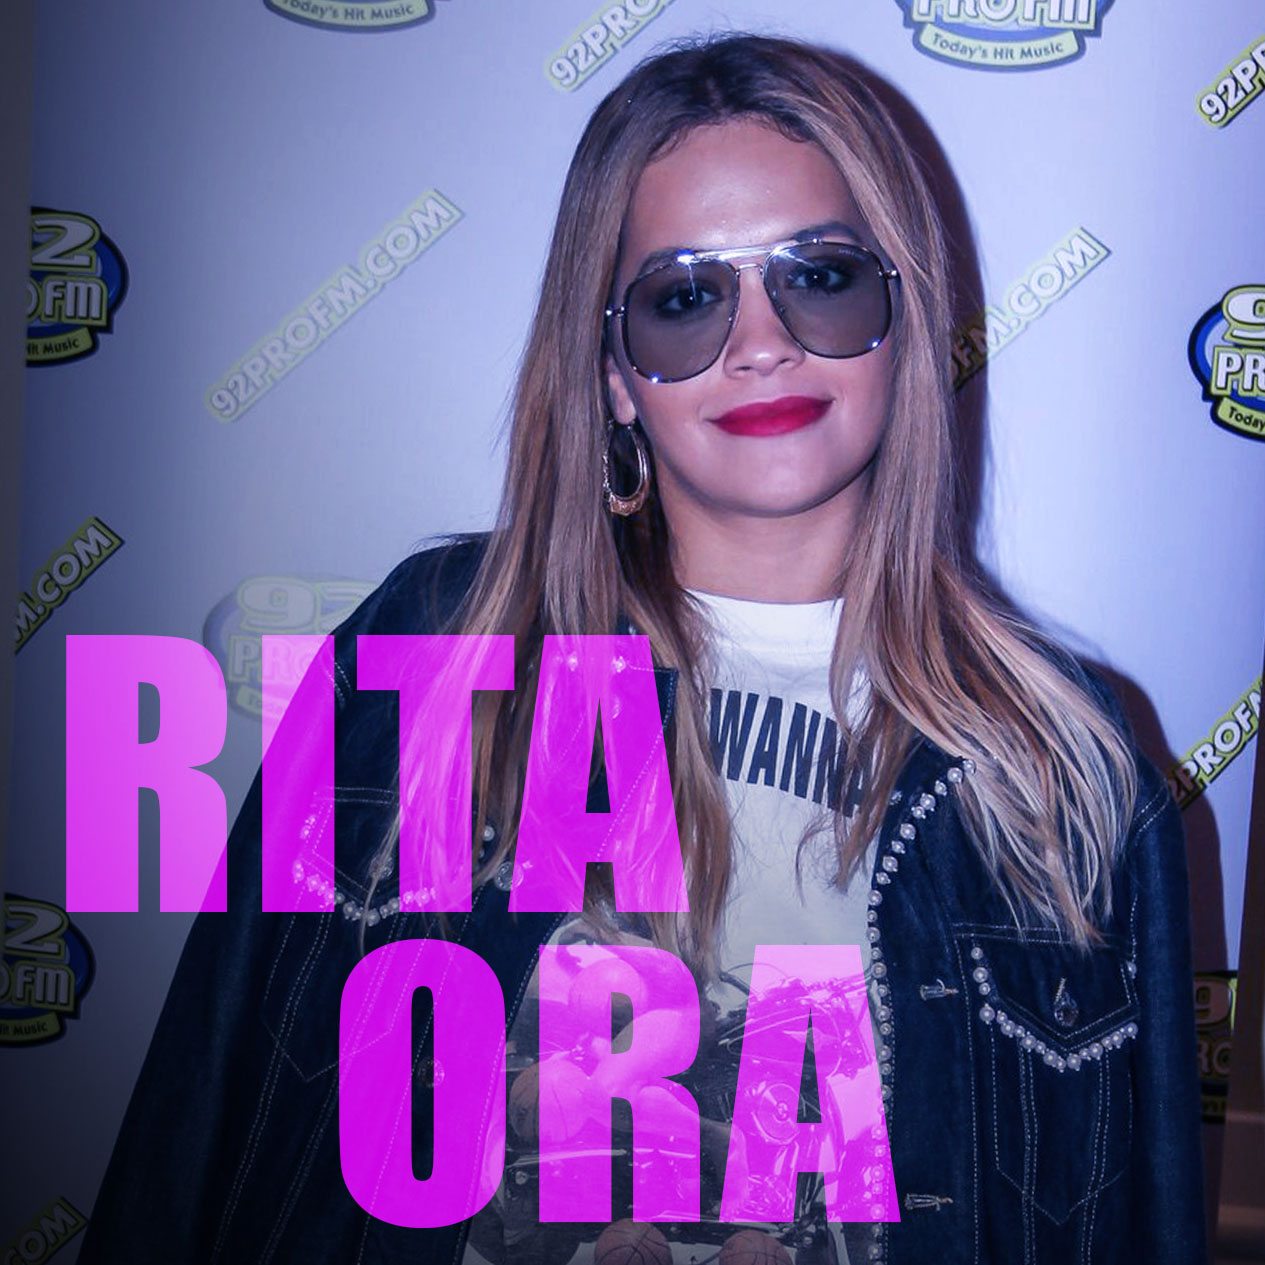 VIDEO: Rita Ora LIVE Private Performance and Interview